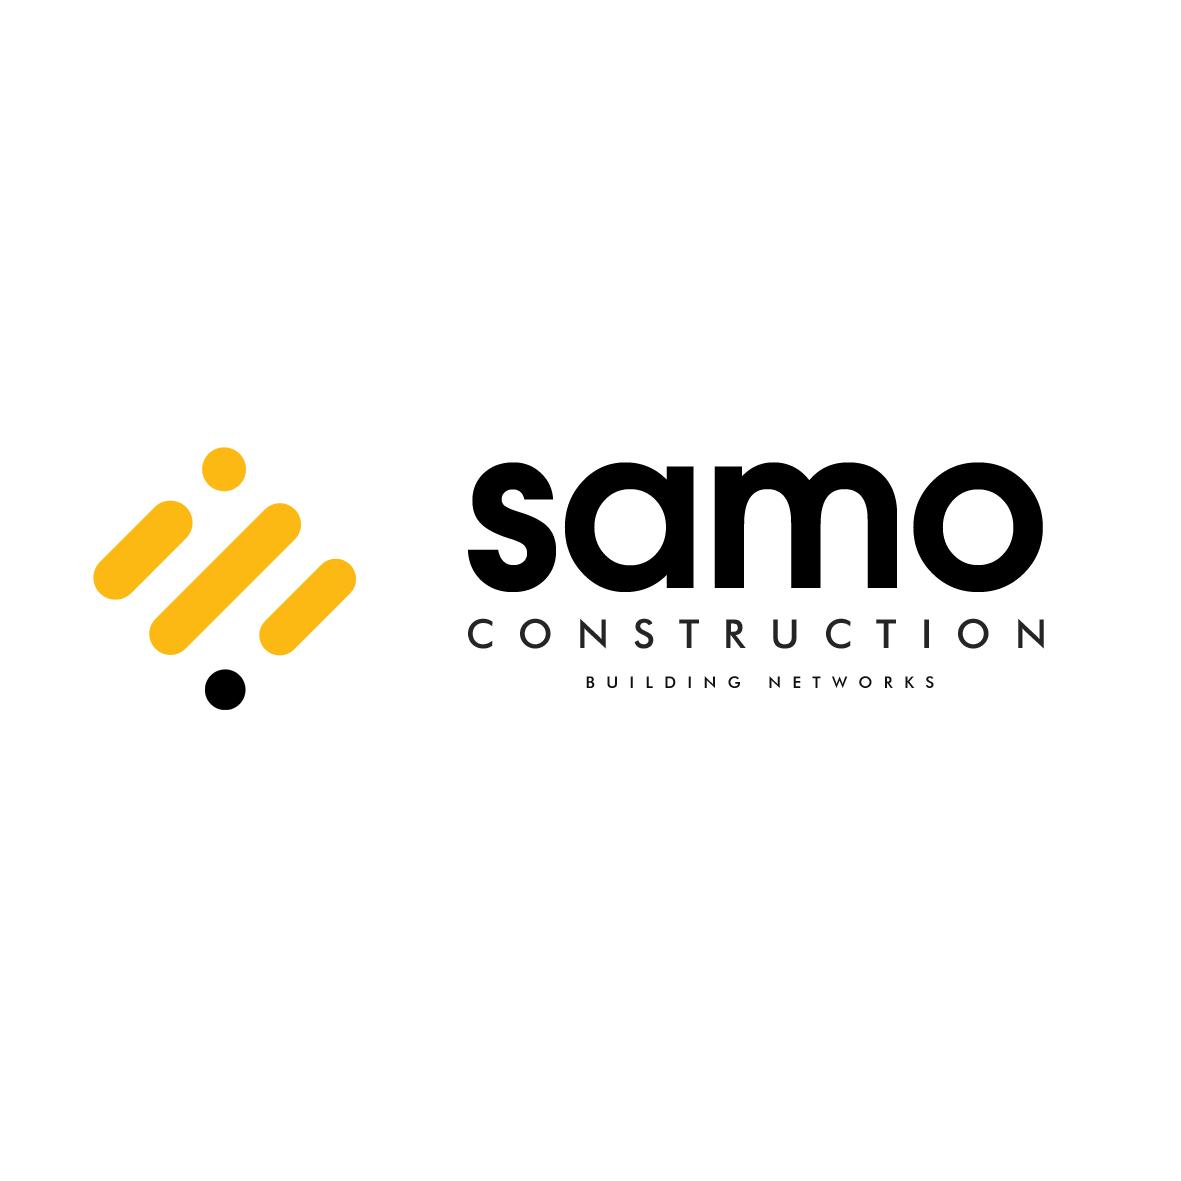 SAMO CONSTRUCTION